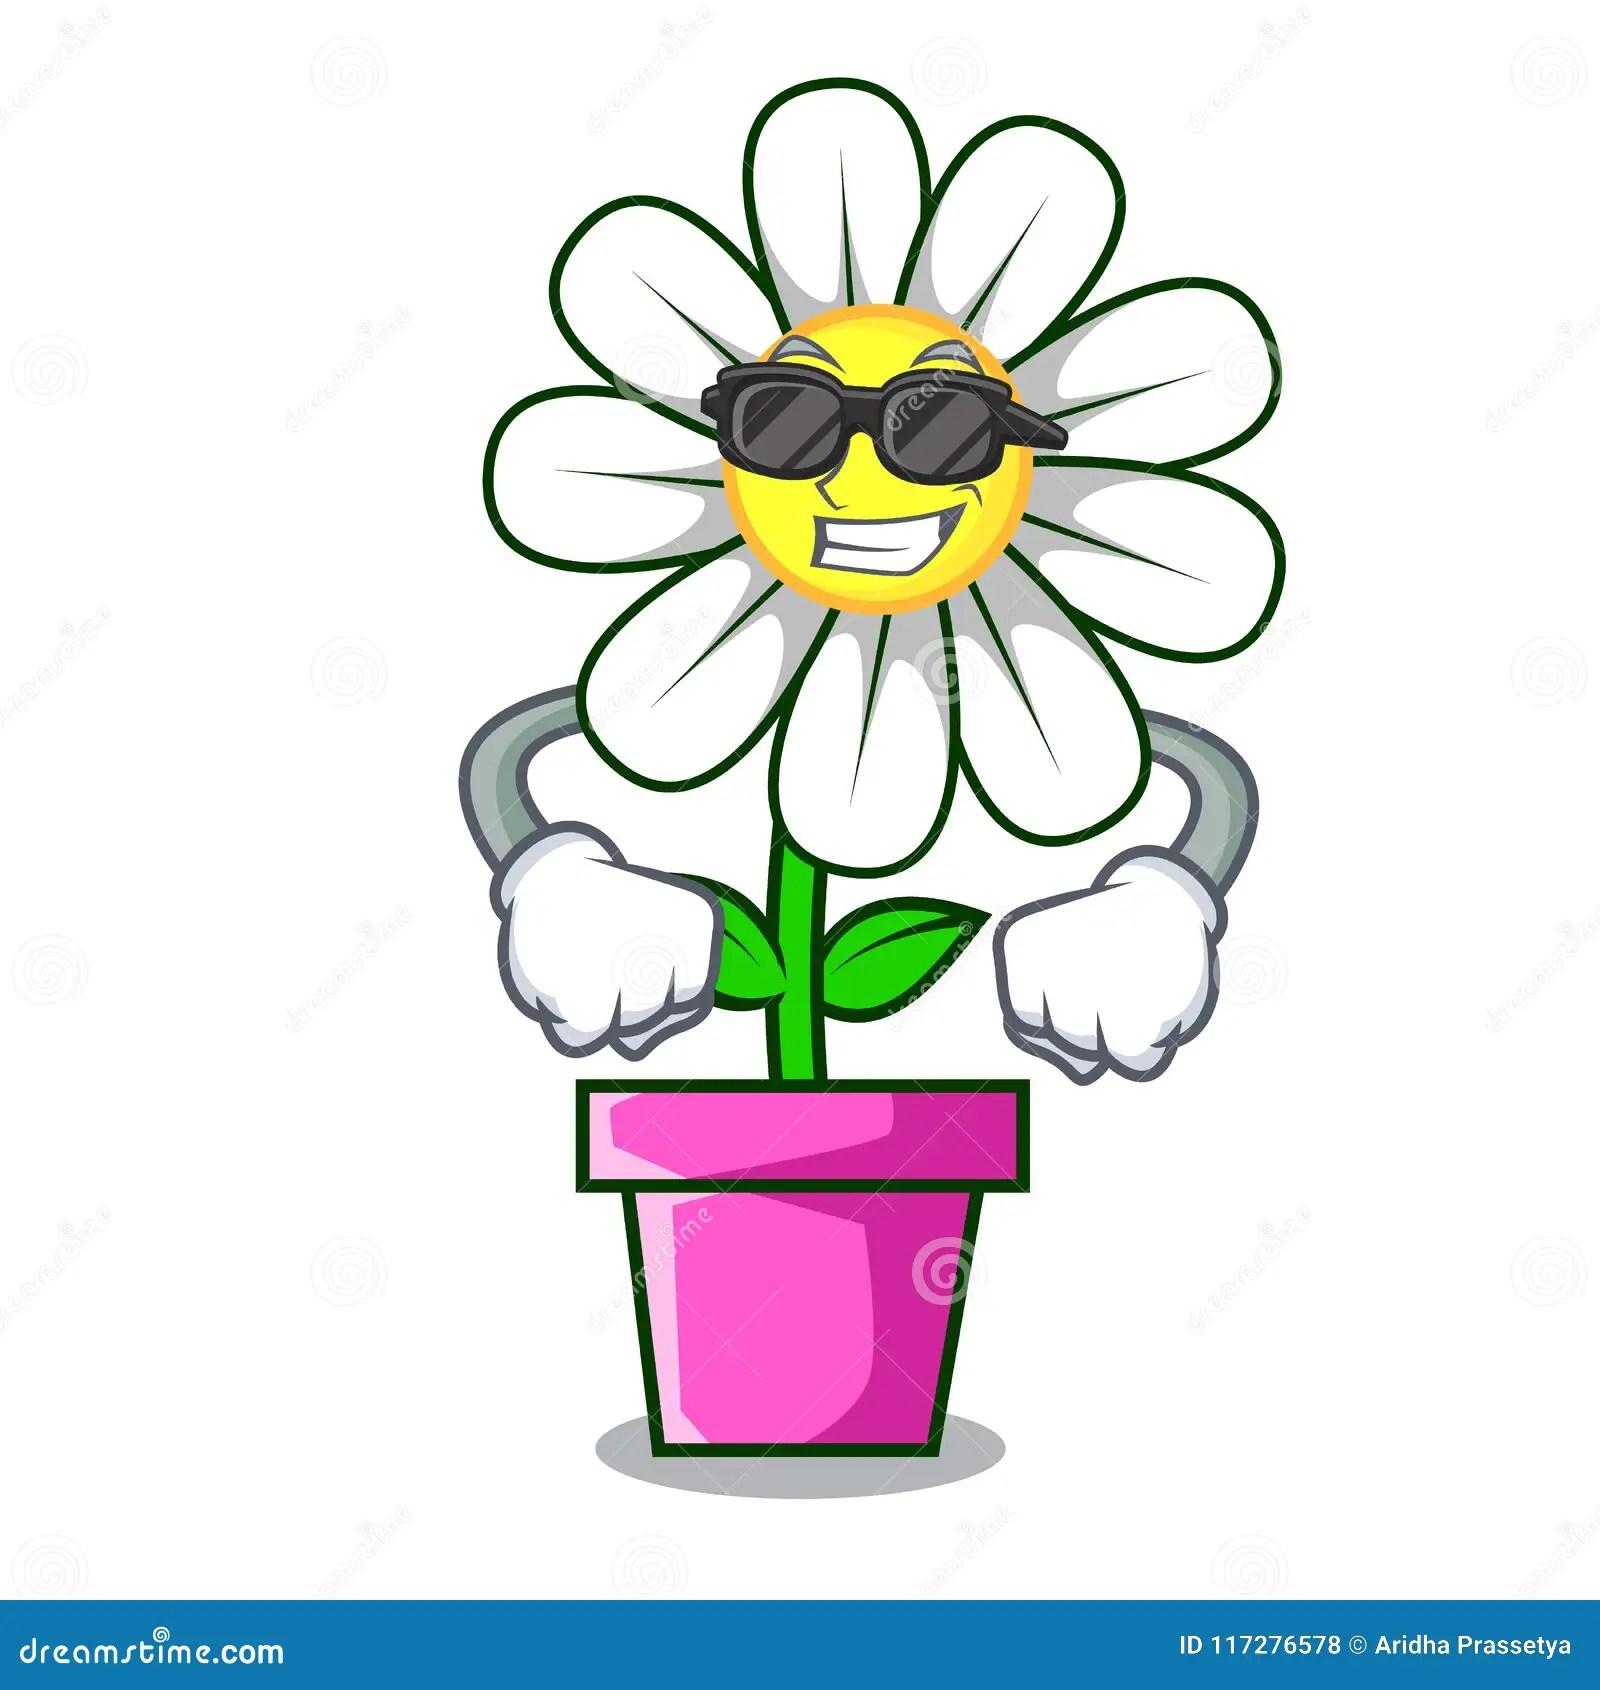 hight resolution of super cool daisy flower character cartoon